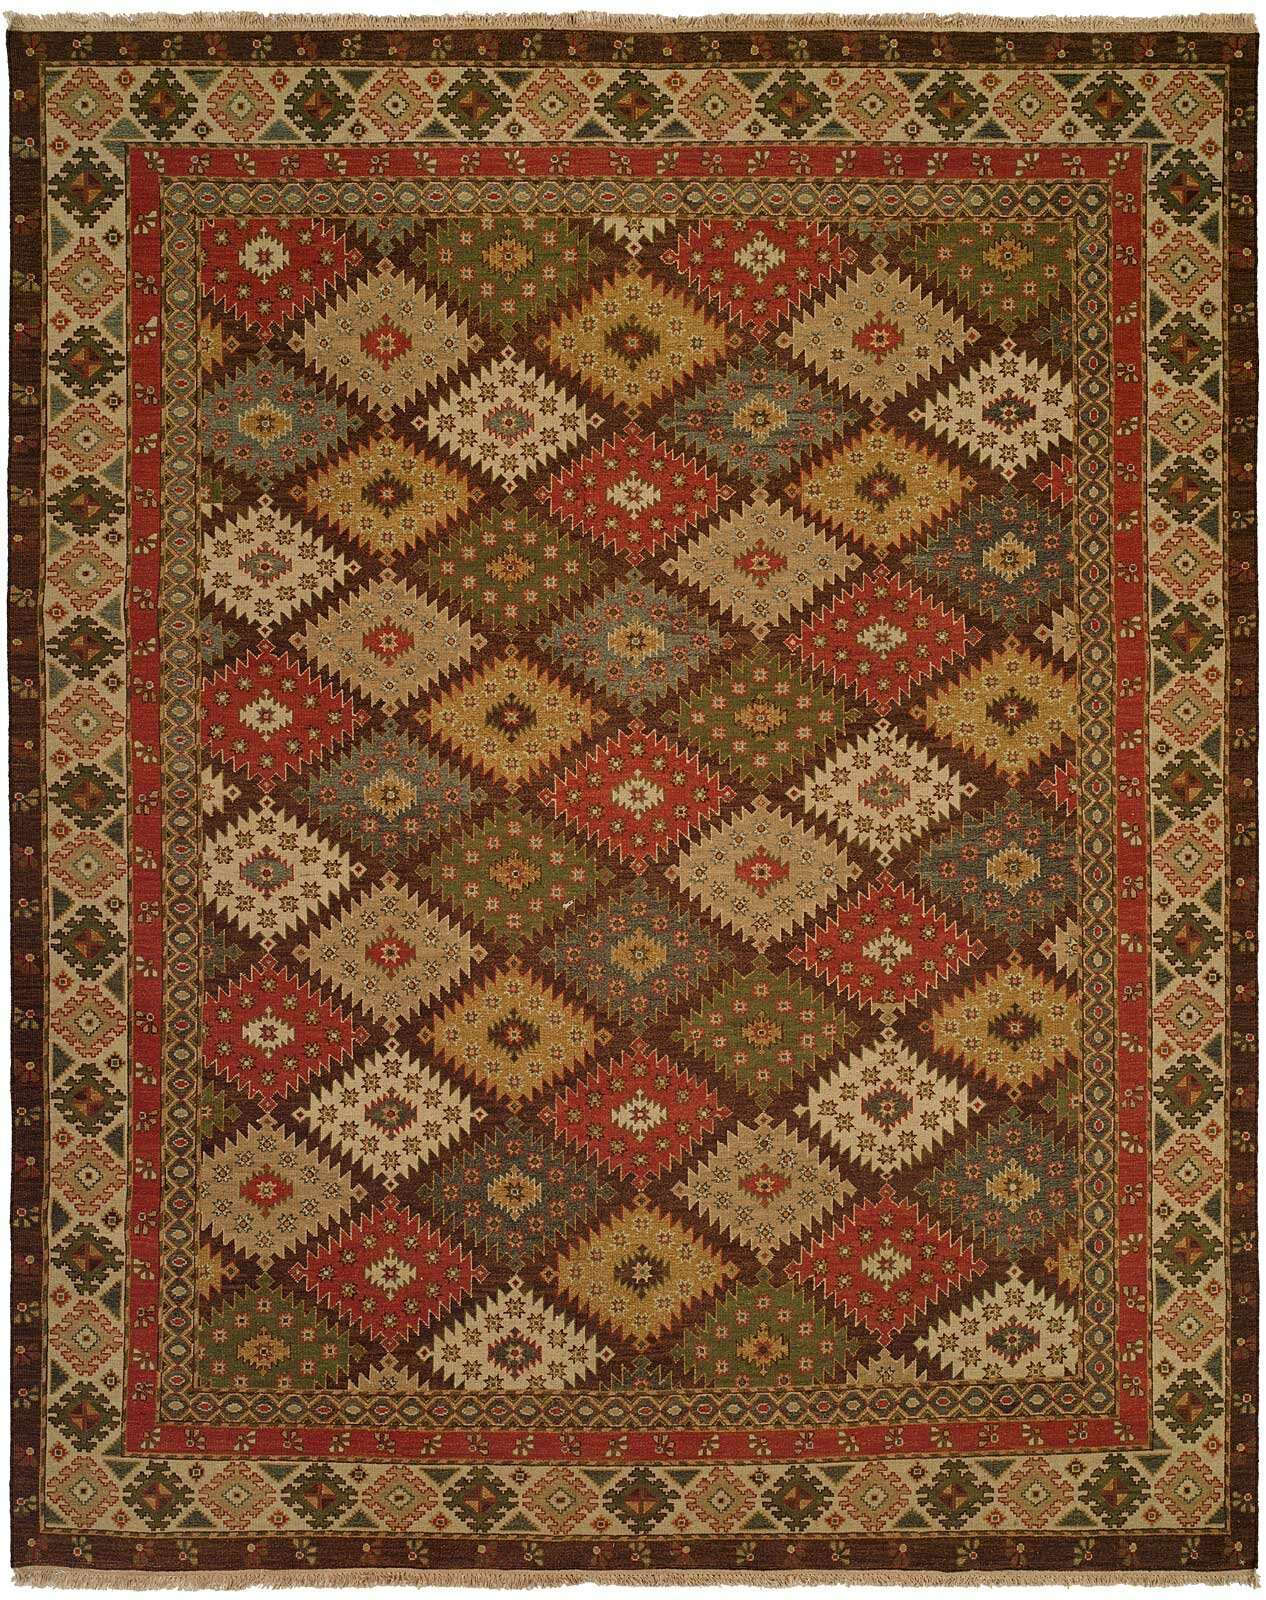 Wildon Home Geometric Hand Knotted Wool Red Brown Area Rug Wayfair